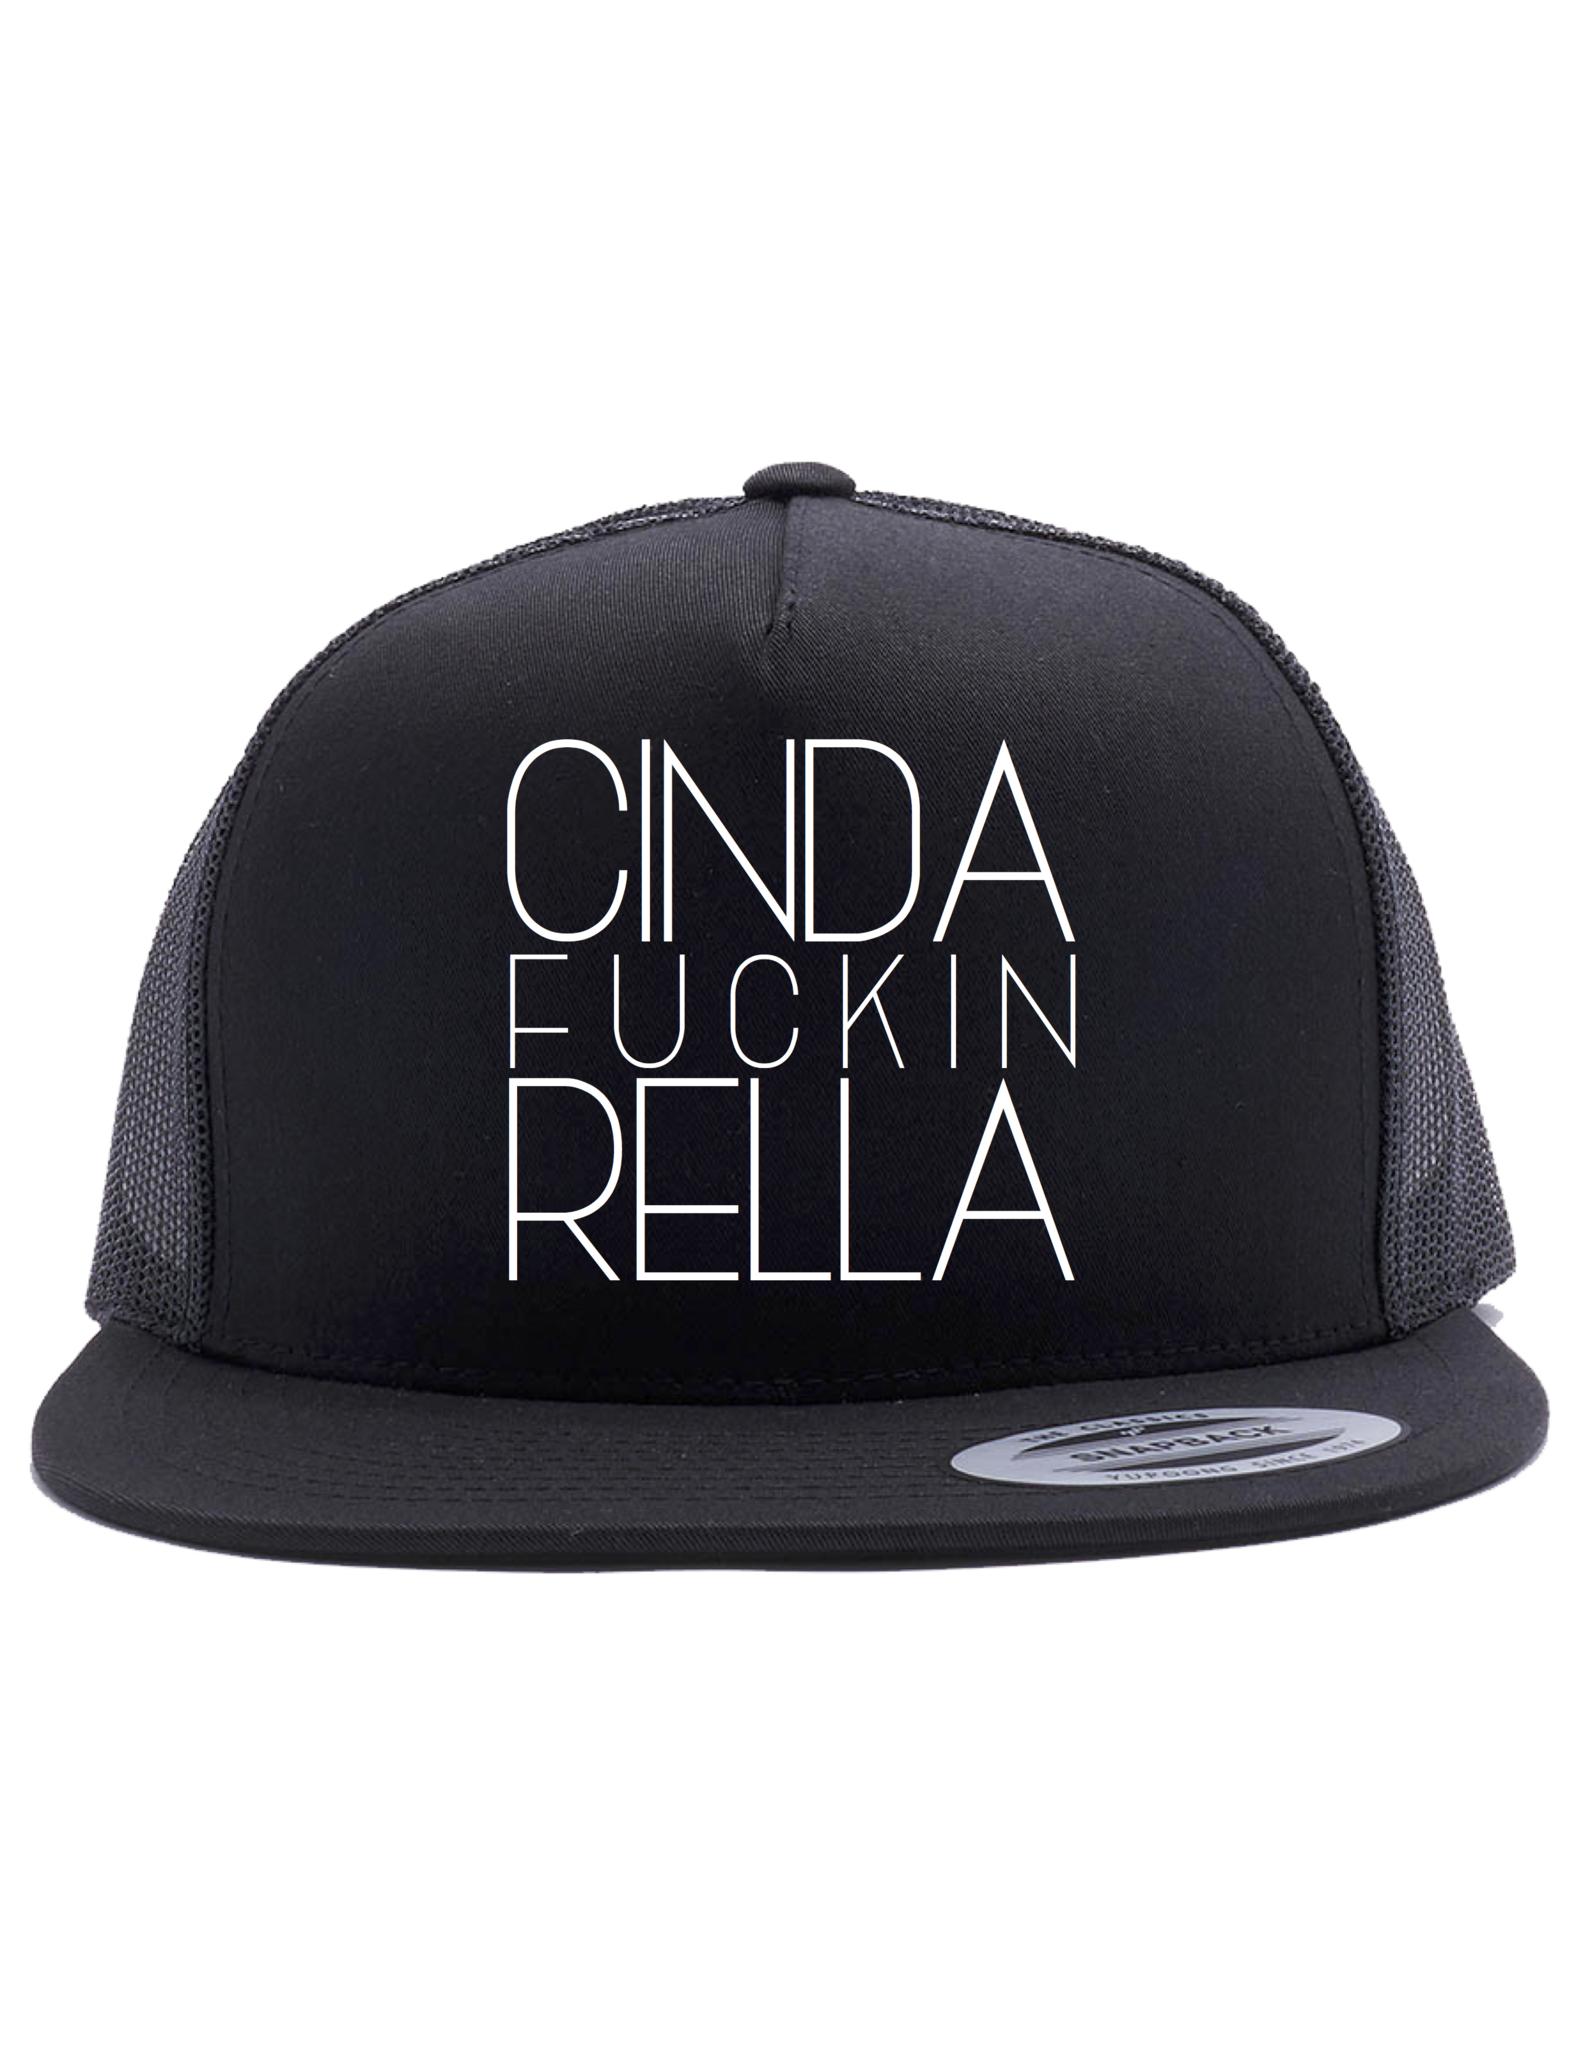 d7cd5c03814 CINDERFUCKINRELLA Trucker Hat (Snapback)